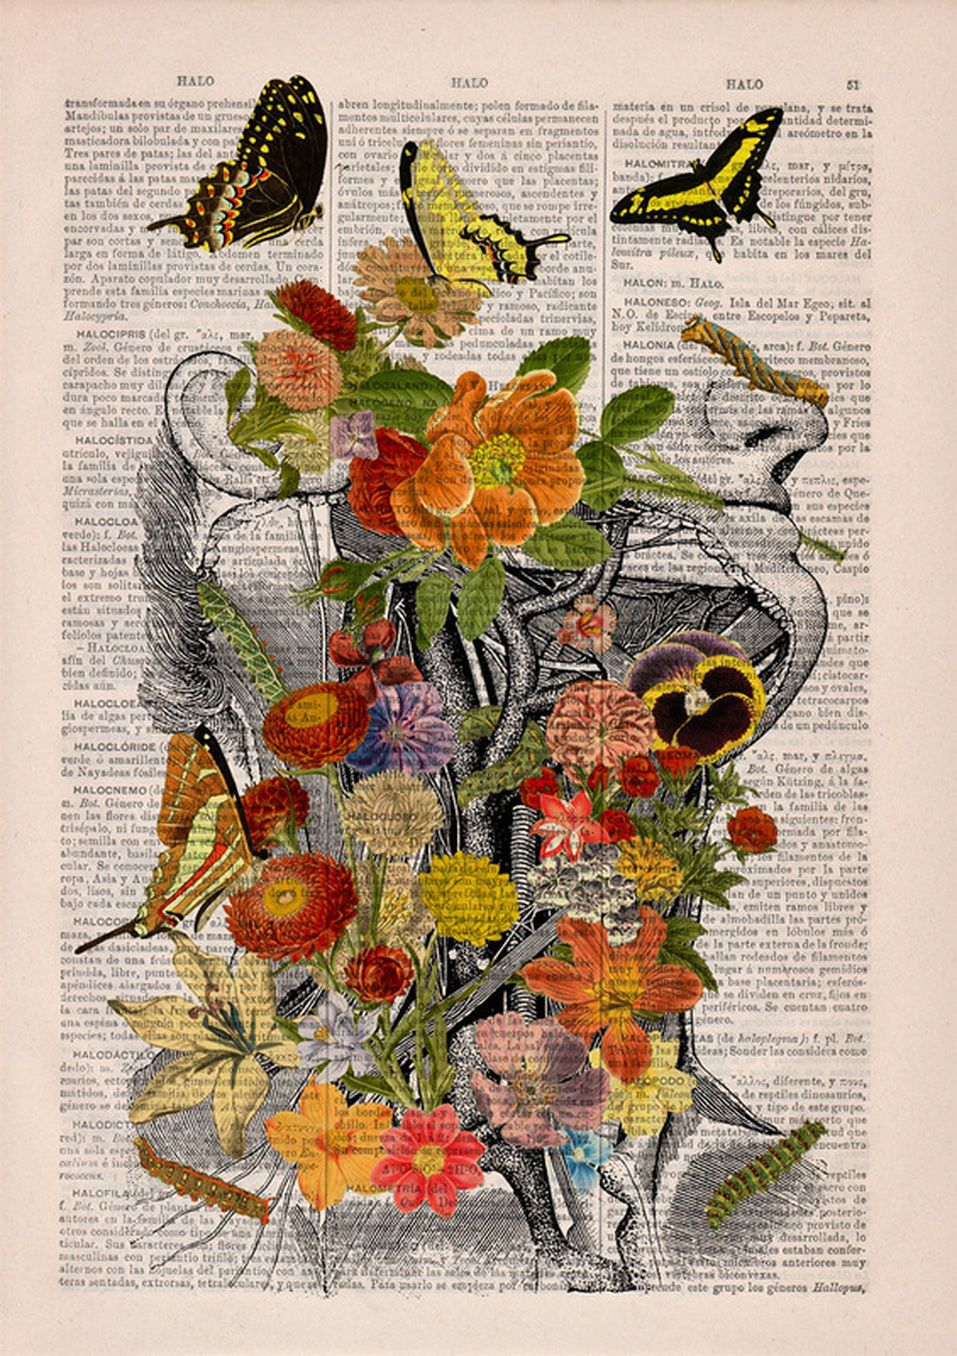 Imagem   quadro quarto   Pinterest   Humano, Anatomía humana y Tela